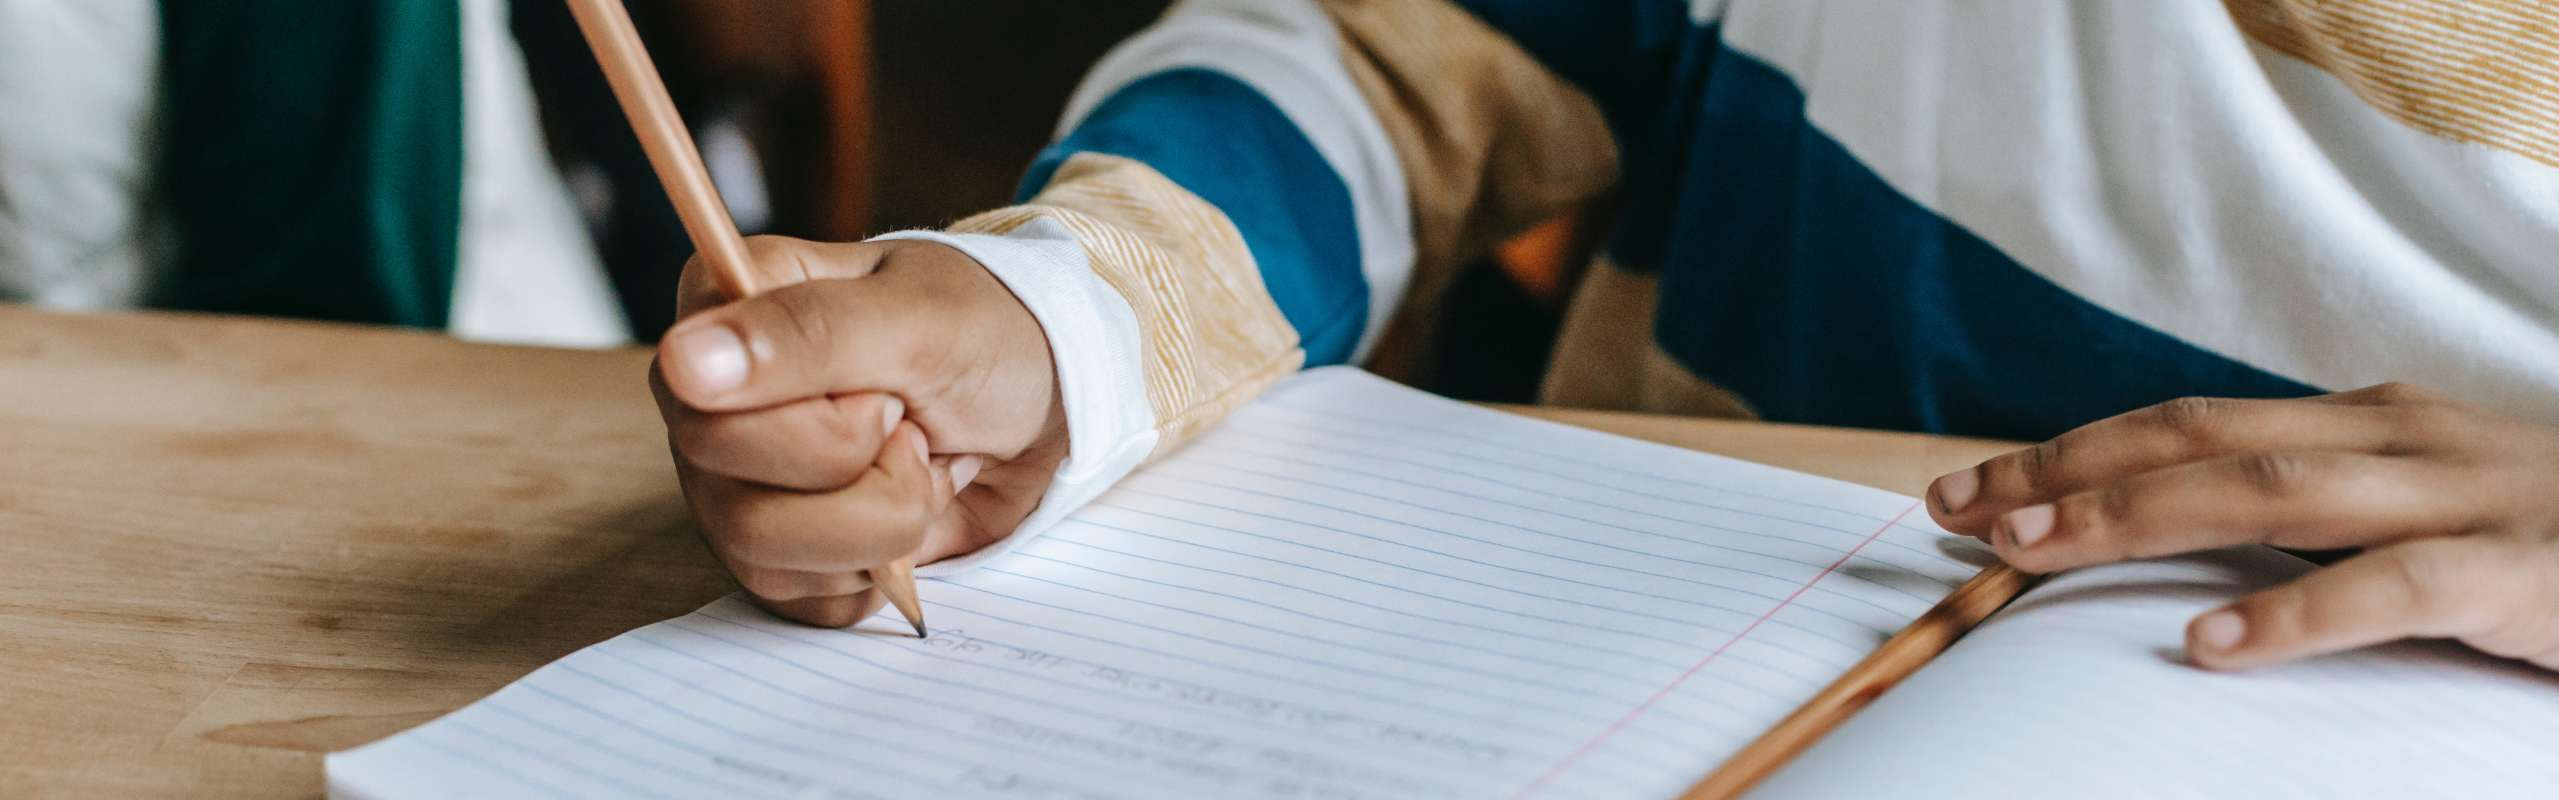 Cómo detectar la dislexia infantil